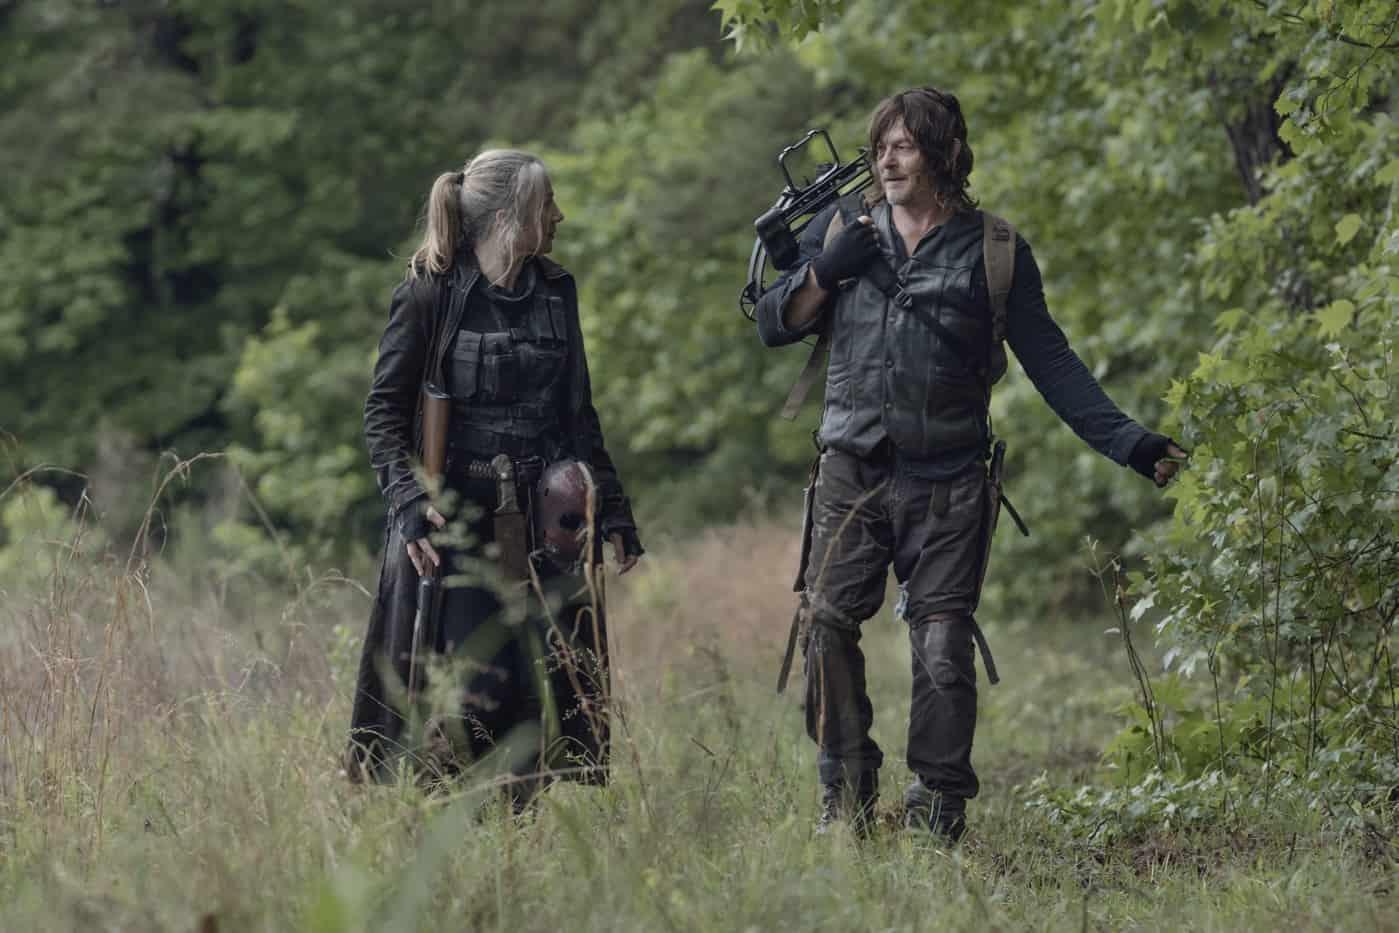 THE WALKING DEAD Season 11 Episode 7 Norman Reedus as Daryl Dixon, Lynn Collins as Leah - The Walking Dead _ Season 11, Episode 7 - Photo Credit: Josh Stringer/AMC